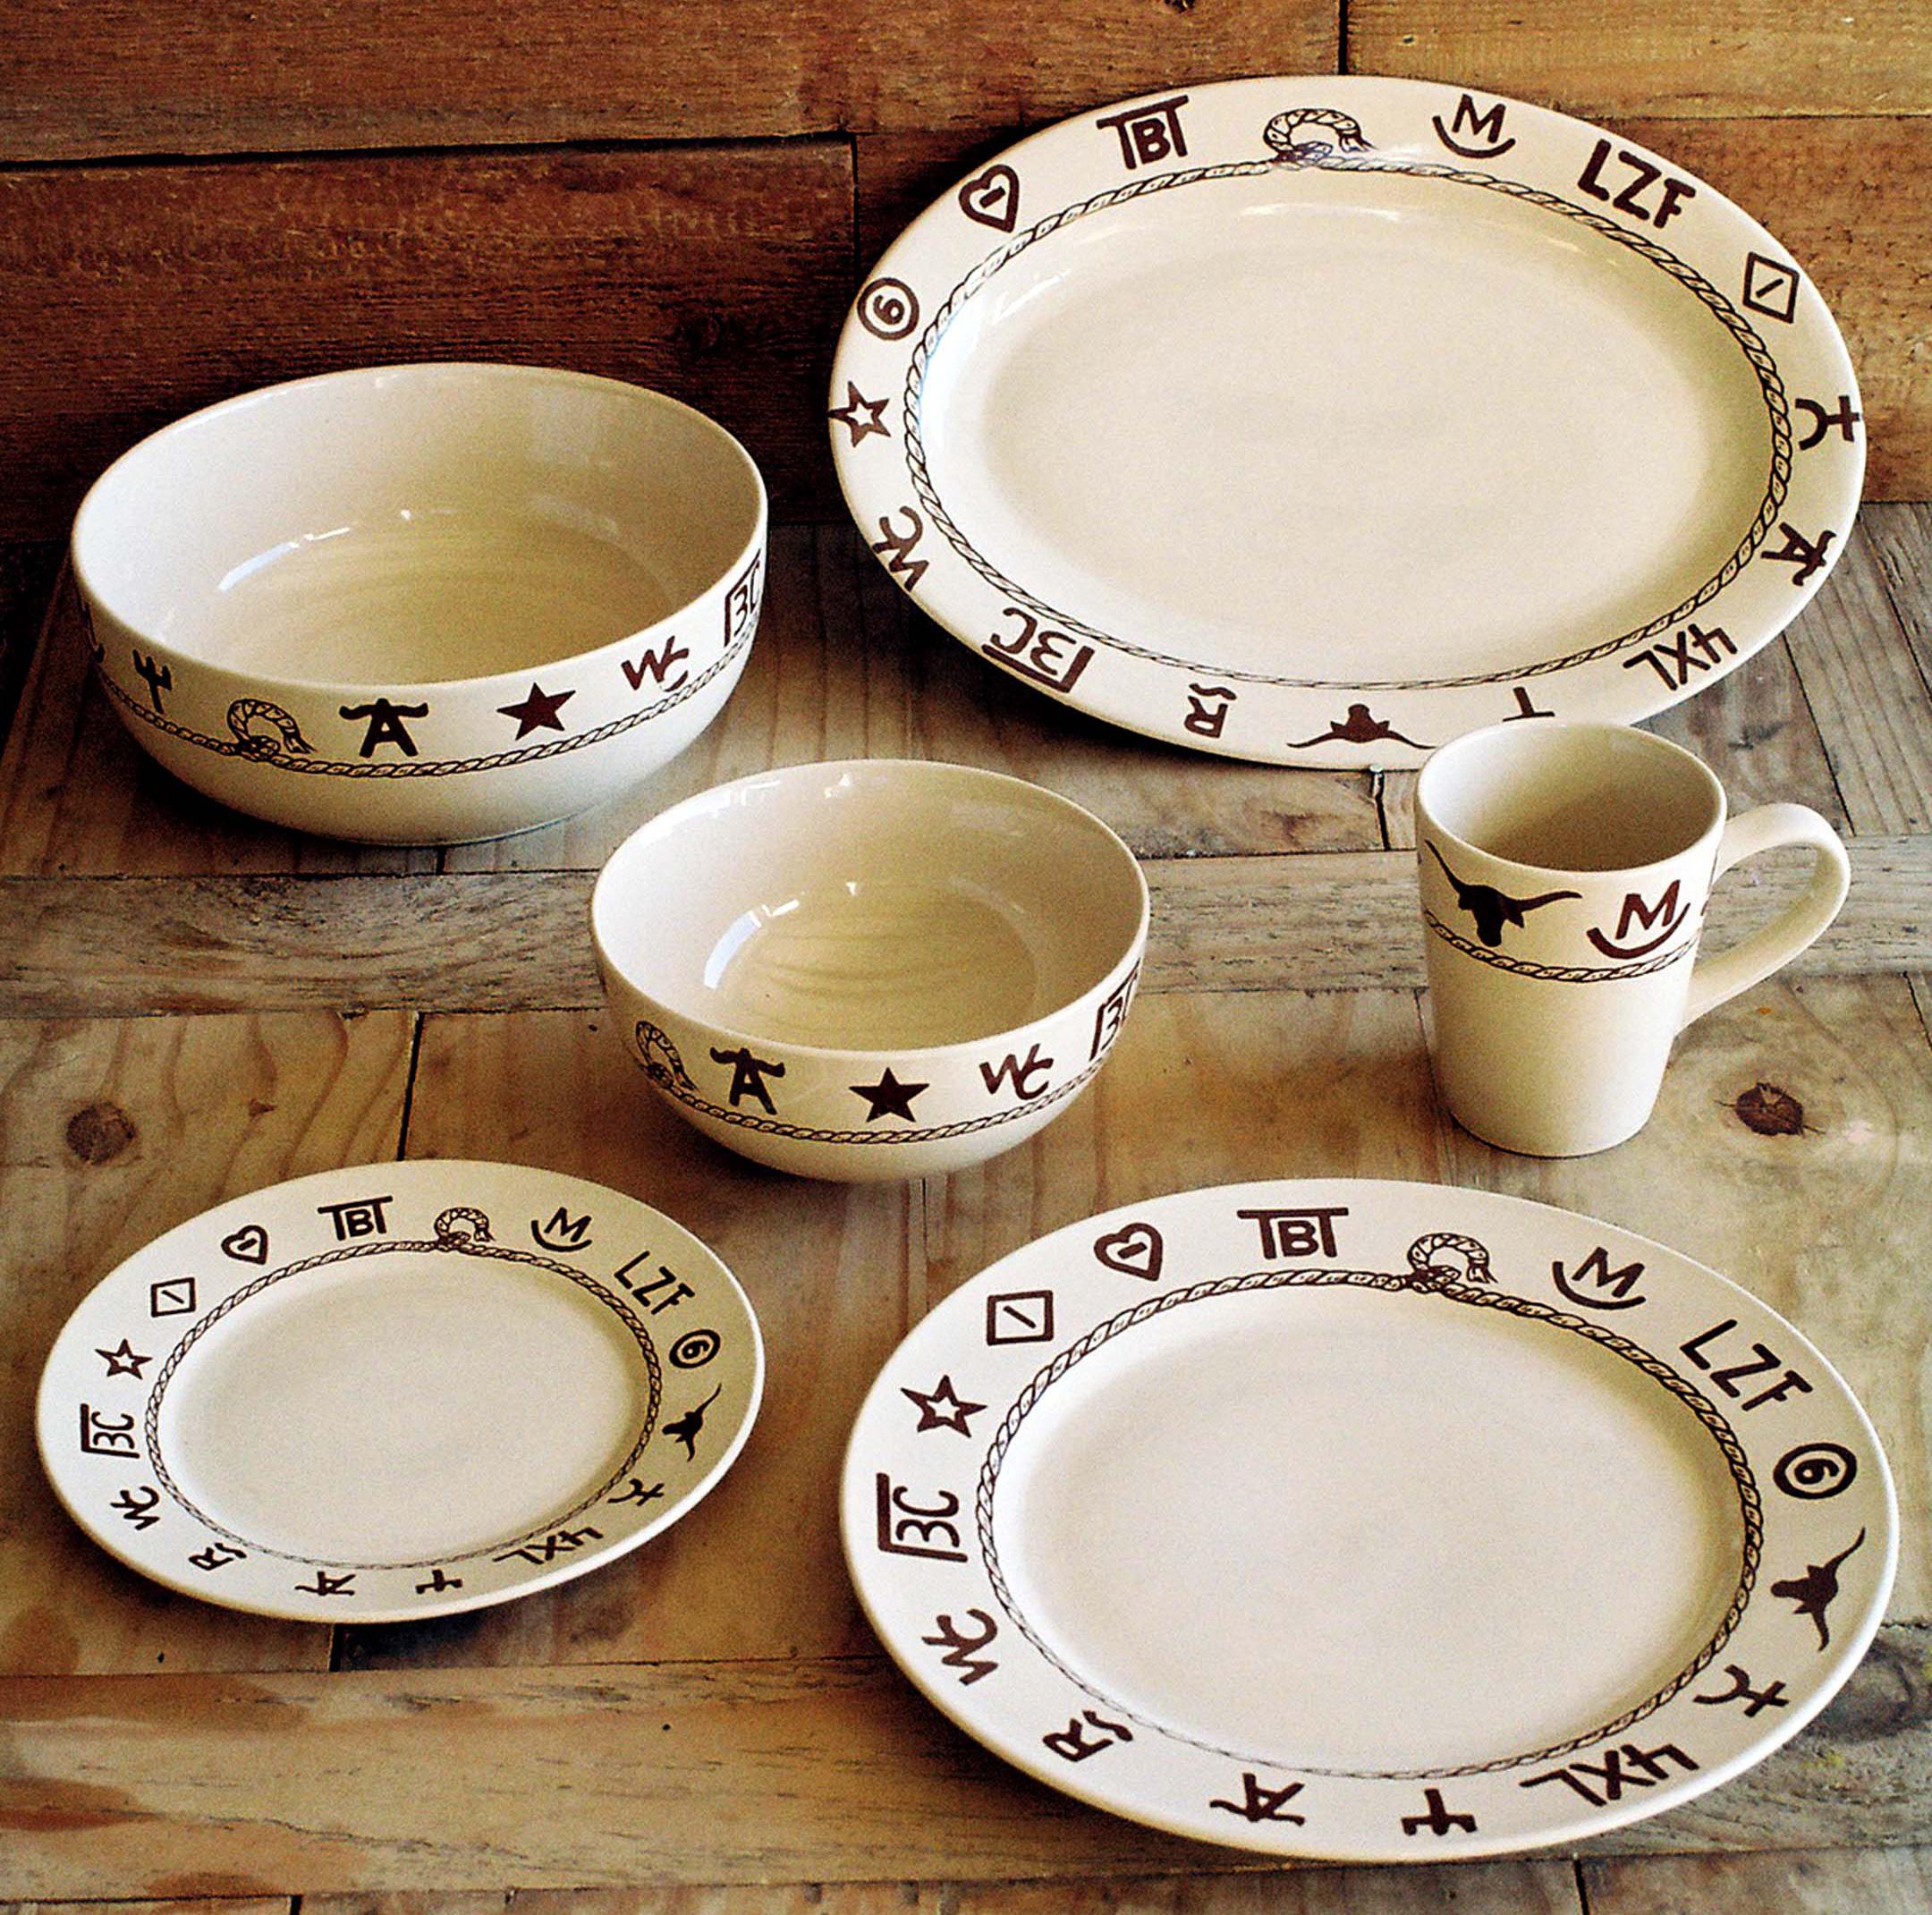 Western Dinnerware Dishware Goblets Branded Dinnerware